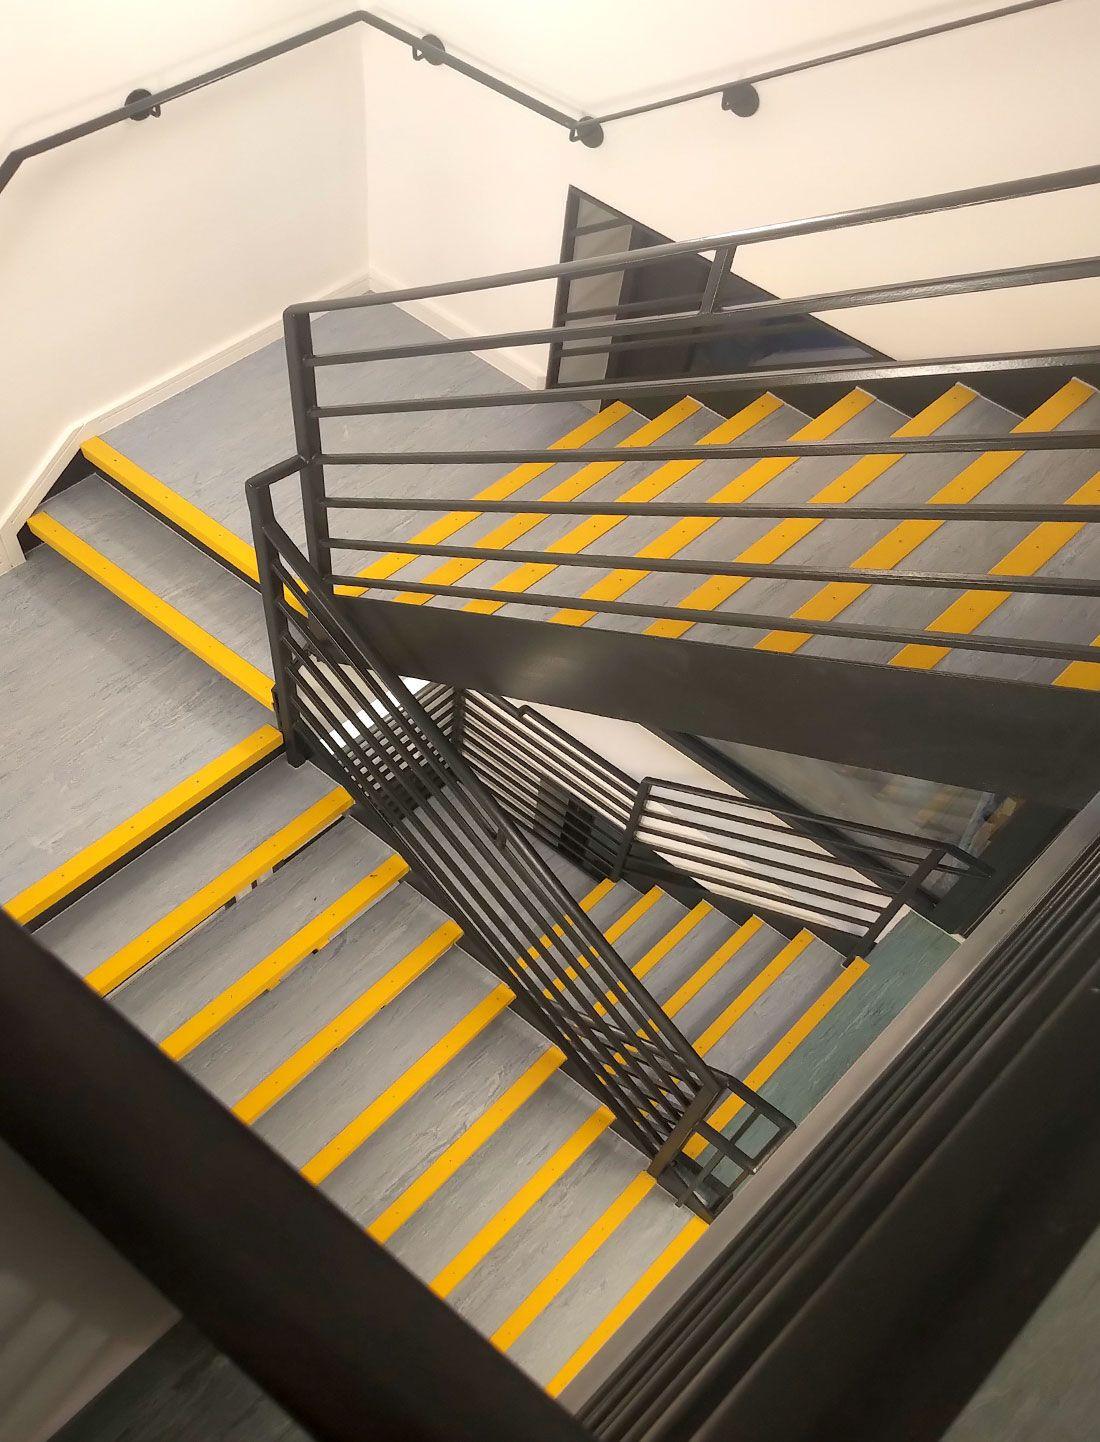 """High contrast AntiSlip Stair Nosings were installed on"